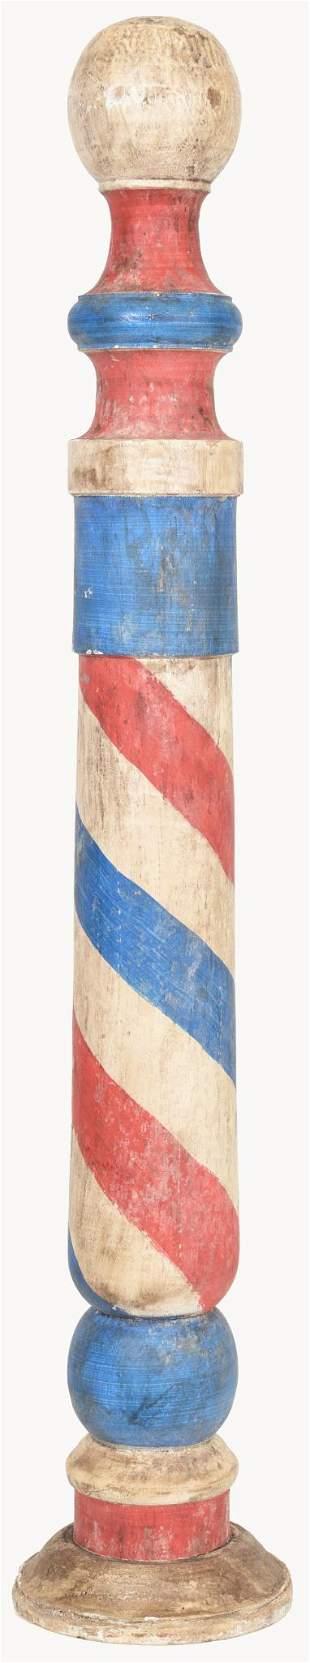 Wooden Barber Pole